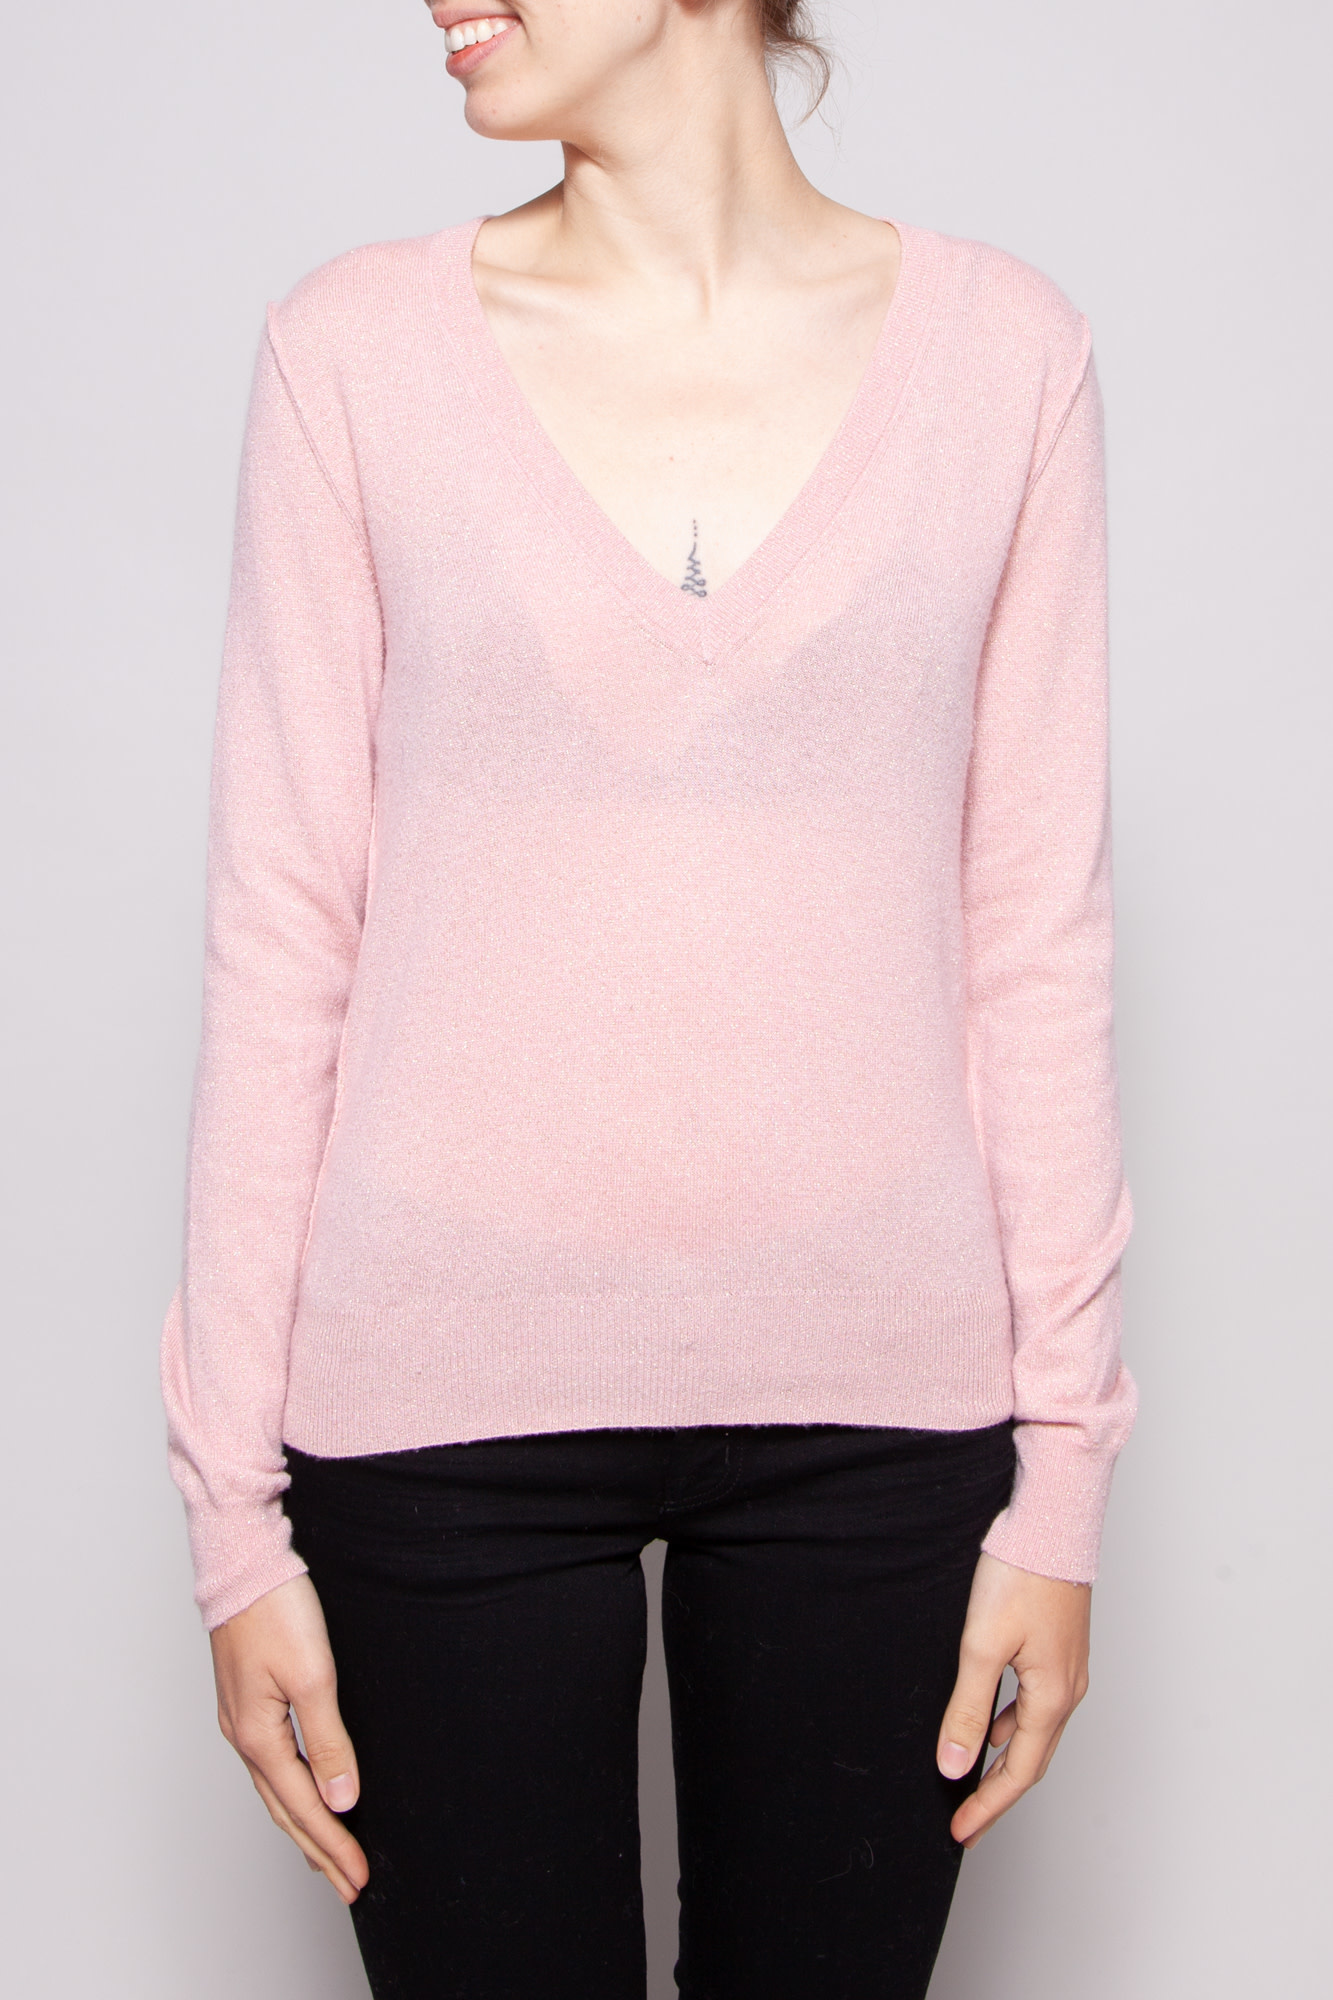 Dolce & Gabbana NEW PRICE (WAS $280) - PINK SHINY SWEATER